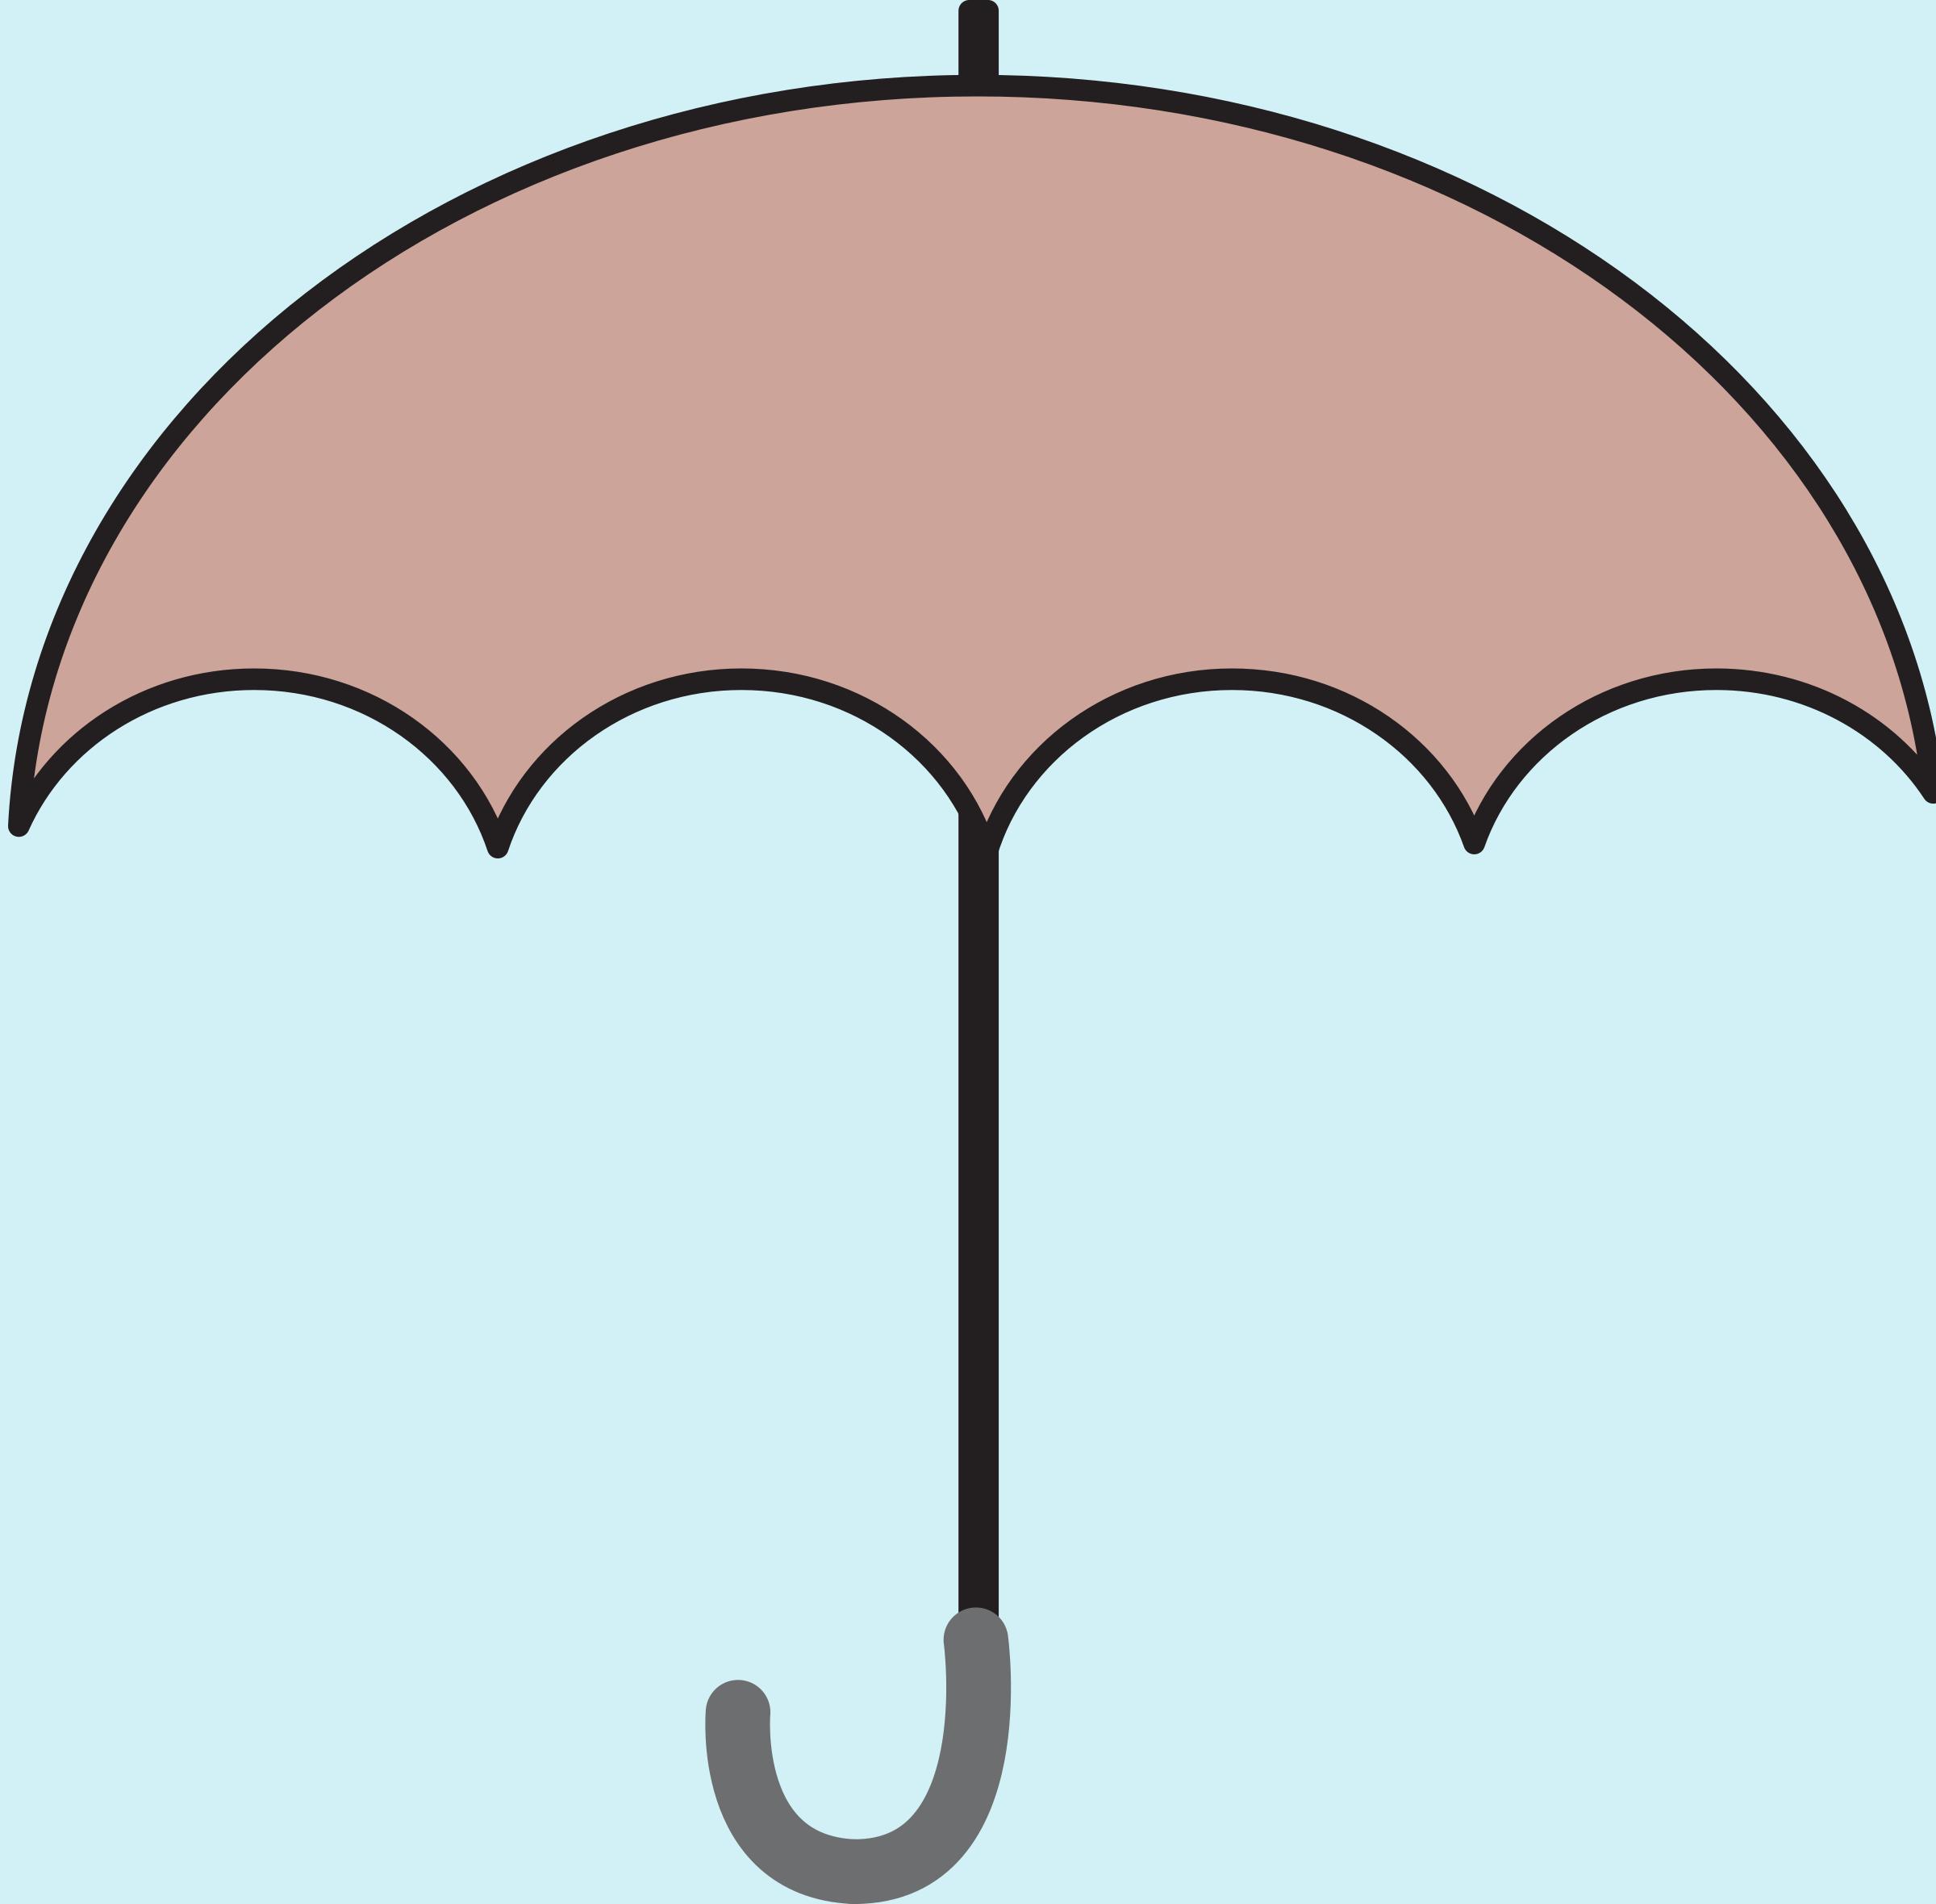 Path clipart animated. Umbrella morphing animation big